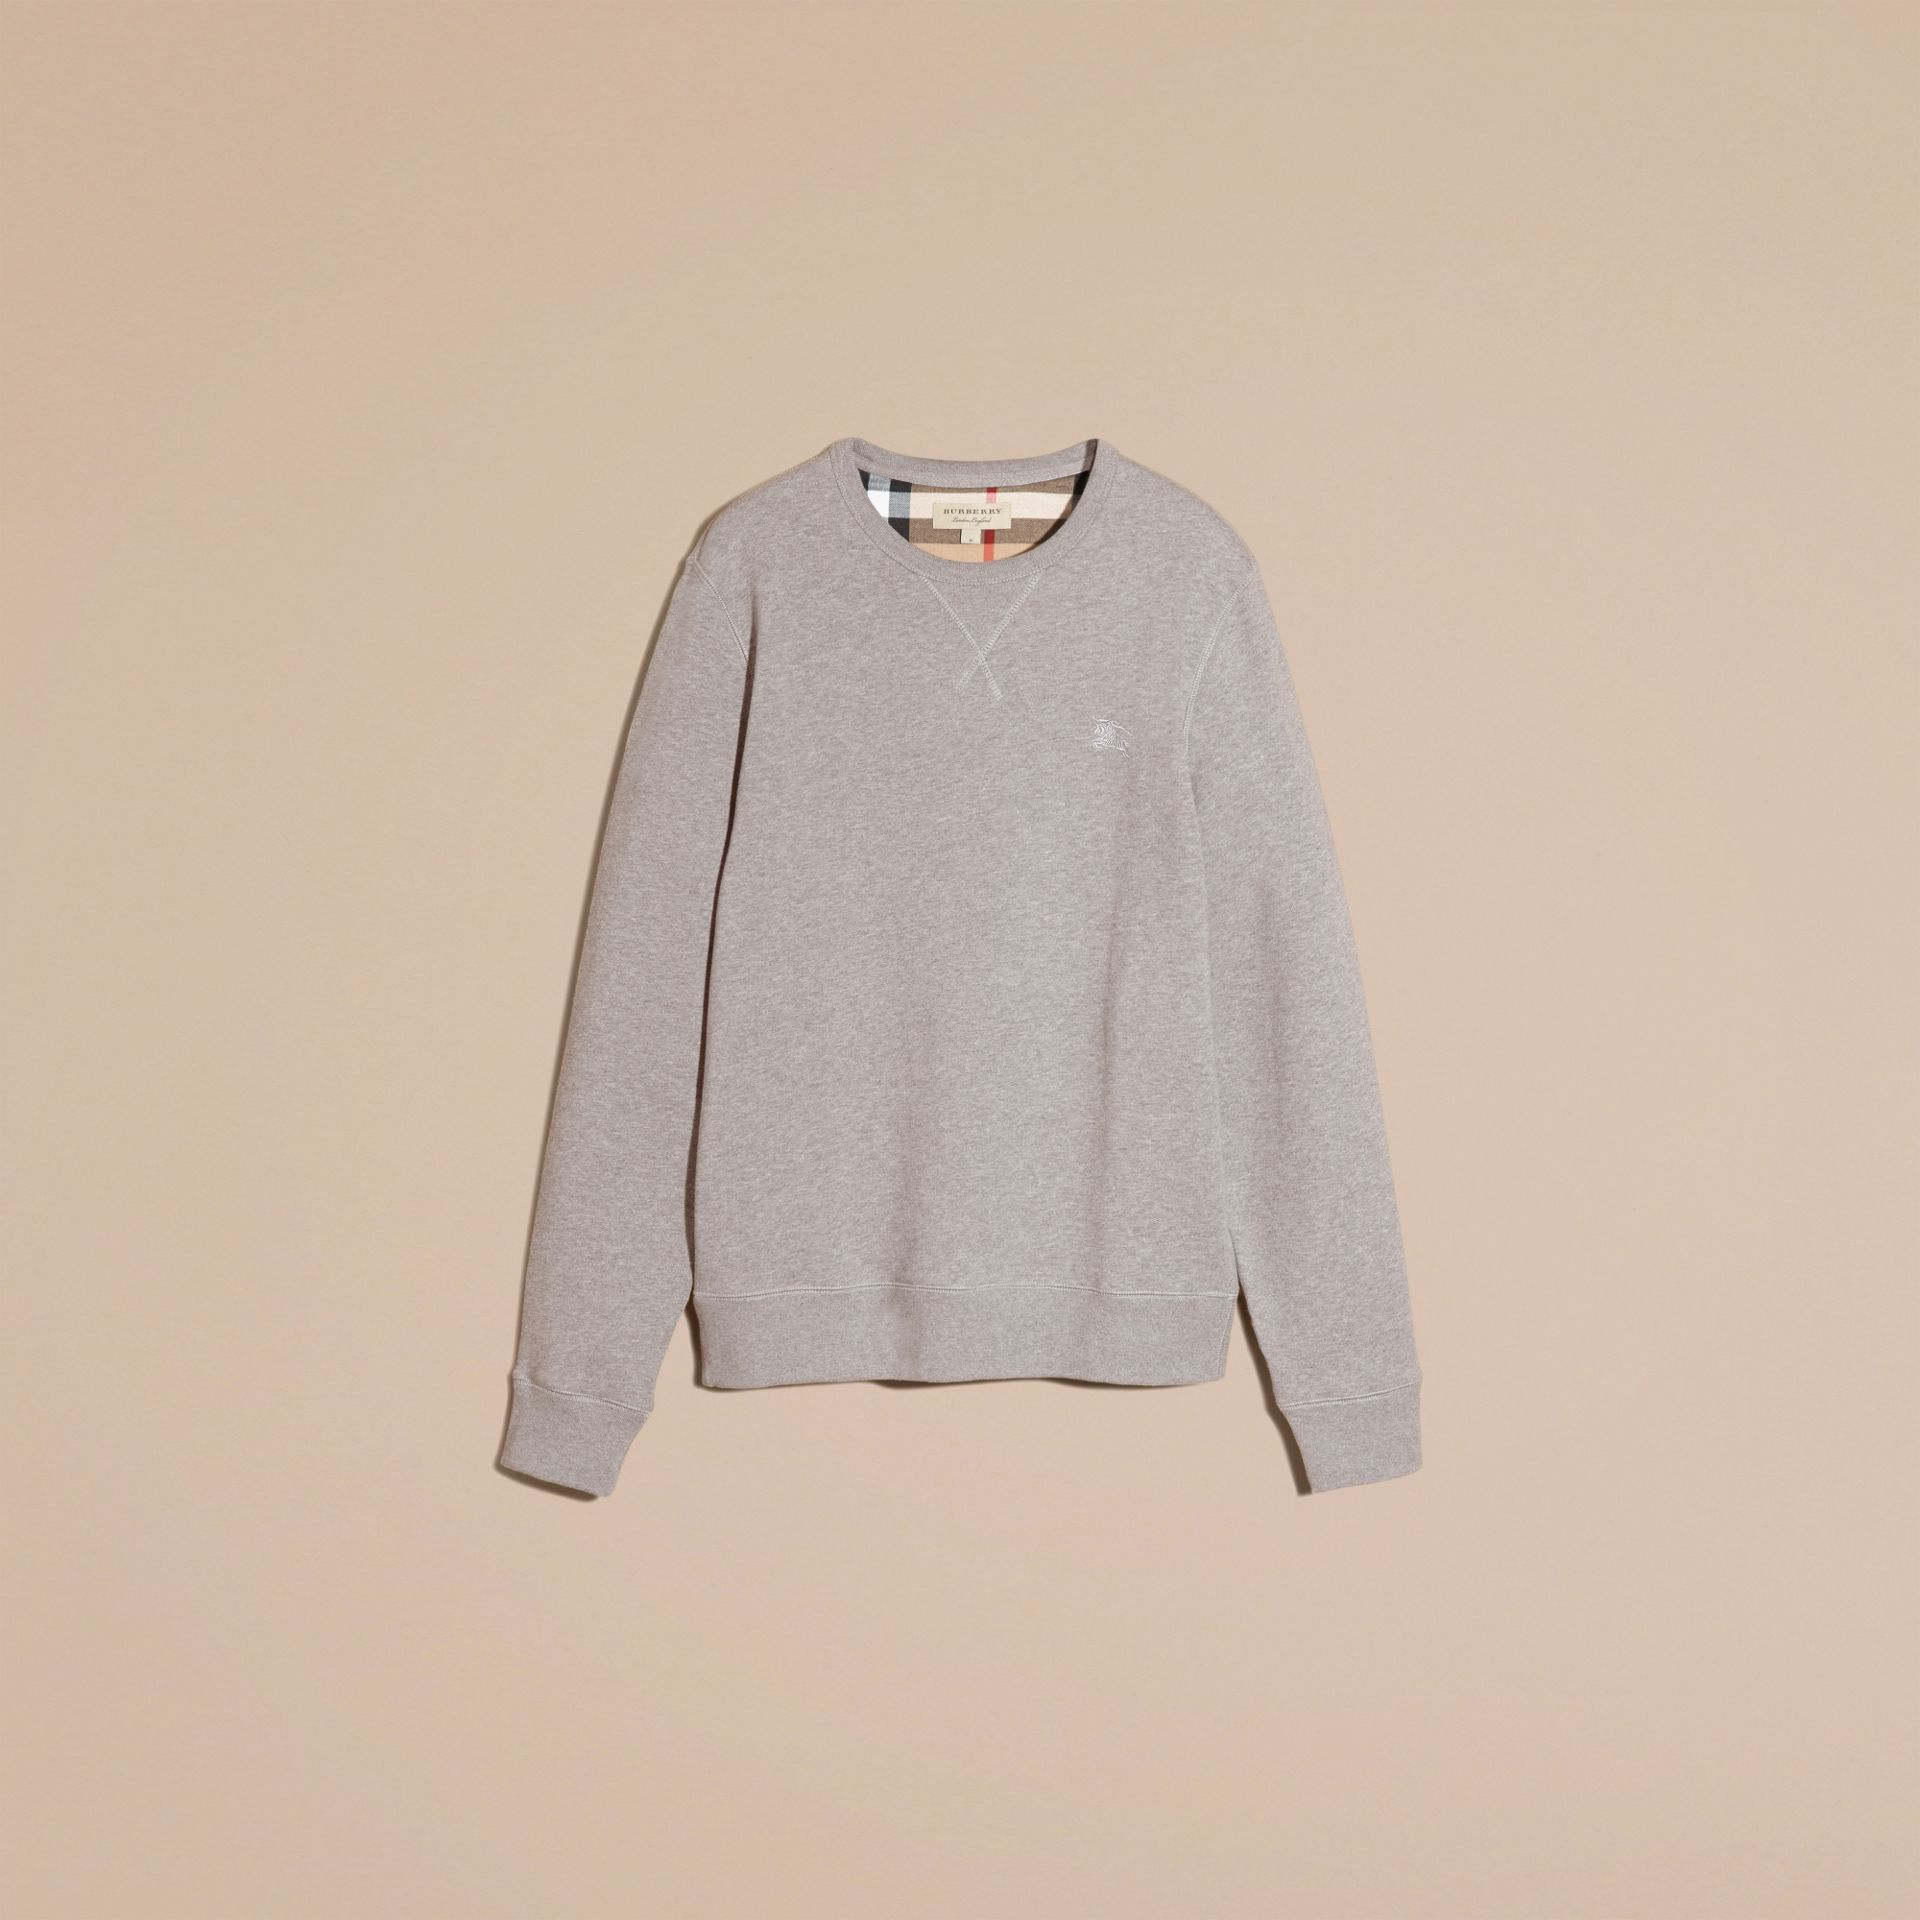 Cotton Blend Jersey Sweatshirt Pale Grey Melange - gallery image 4